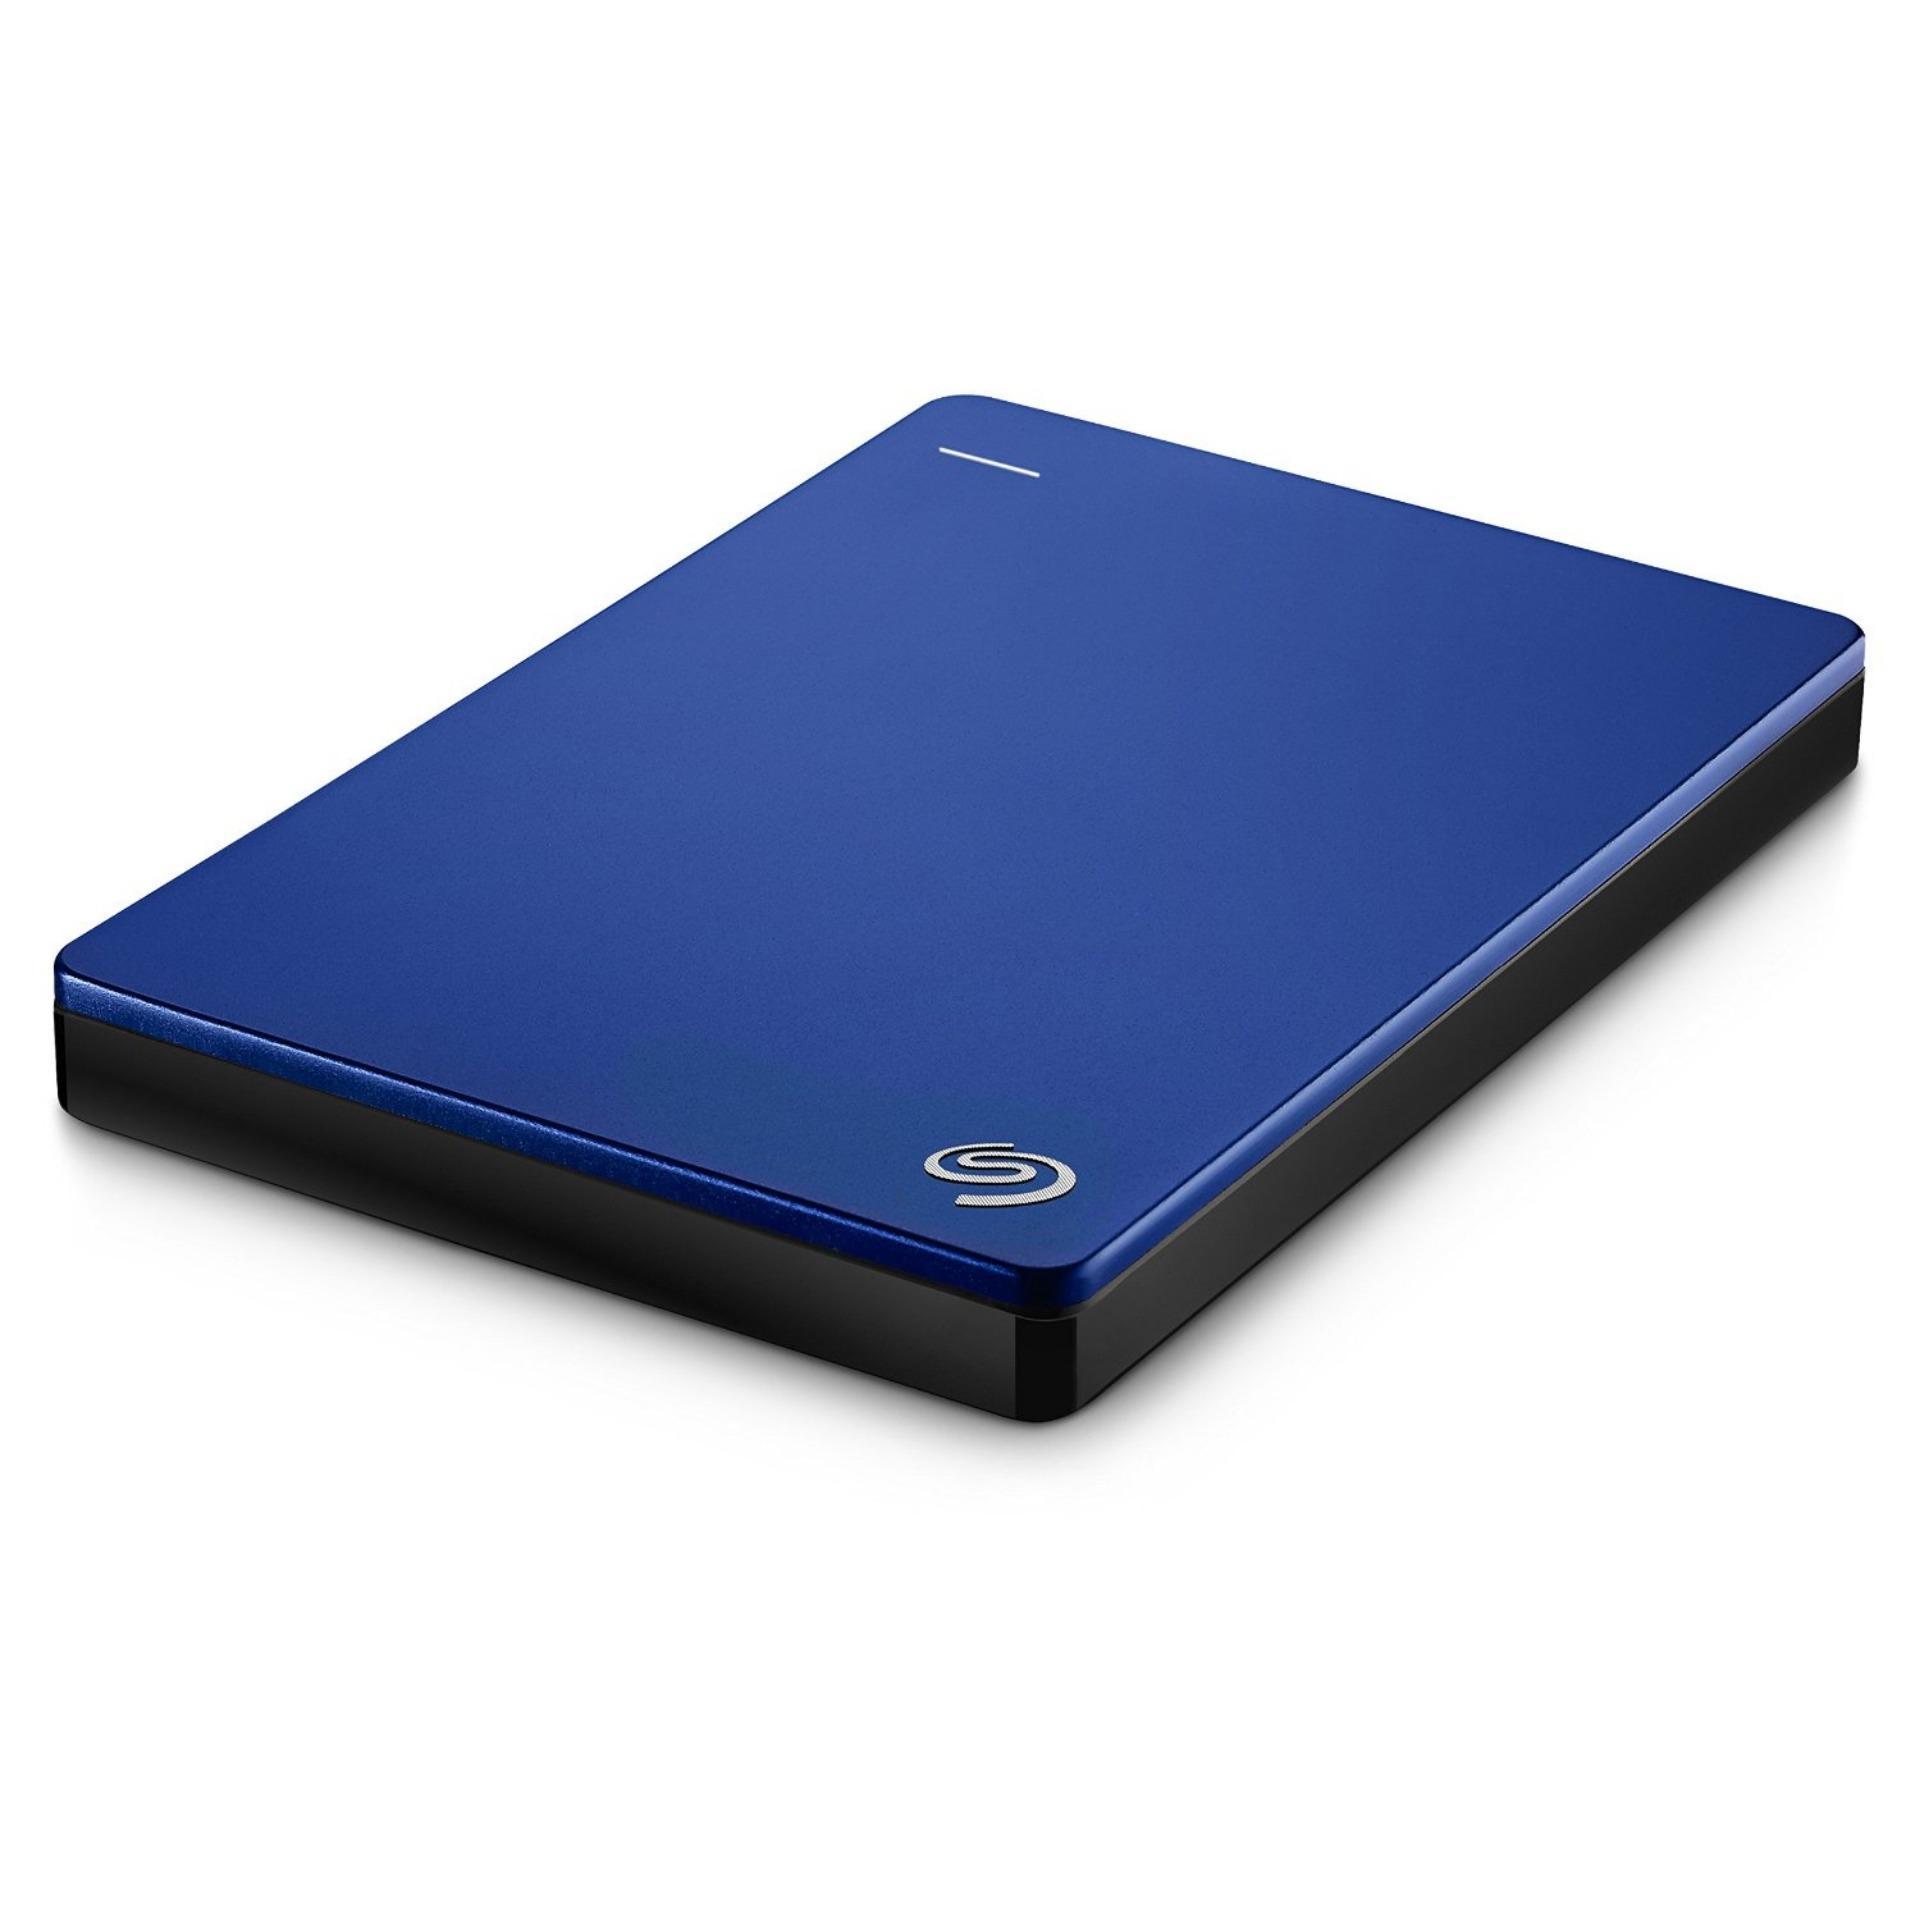 Seagate Cube 30 Harddisk Eksternal 500gb 25 Usb30 Hitam Pouch Pen Backup Plus Slim 1tb 25inch Silver Free Hdd